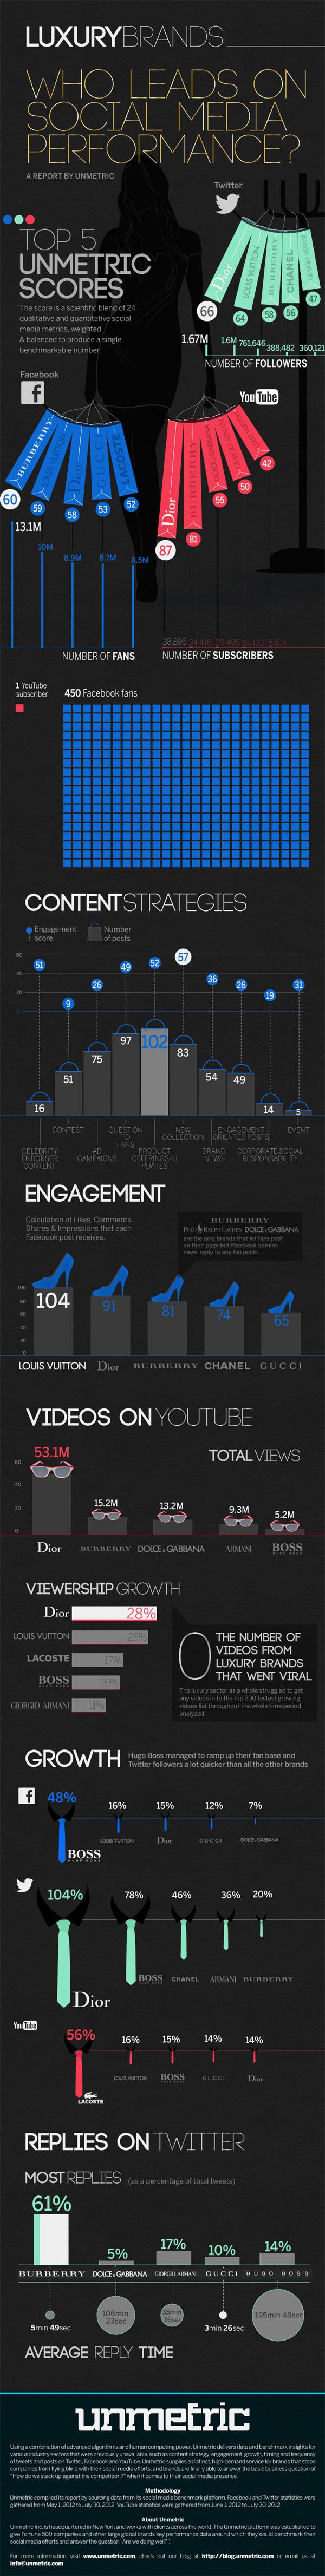 Top Luxury Brands on Social Media